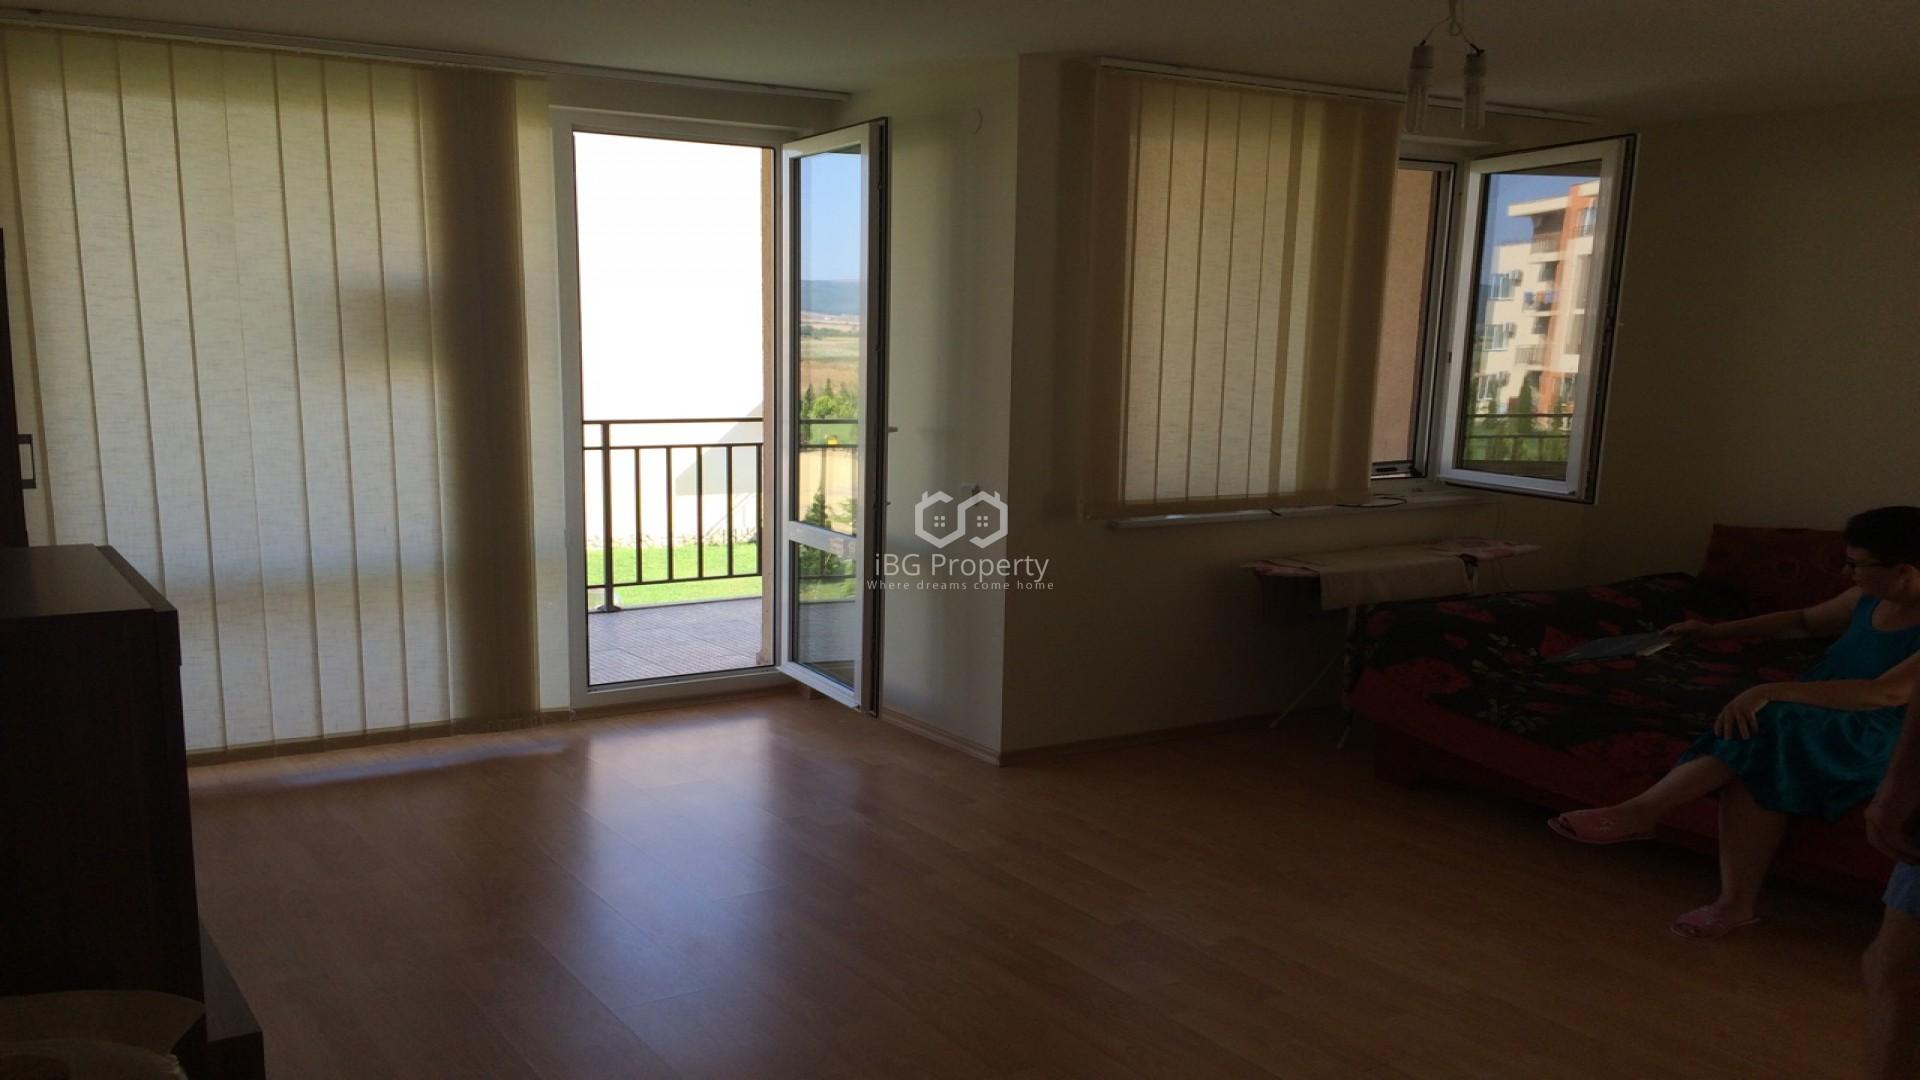 Eдностаен апартамент Слънчев Бряг 52 m2